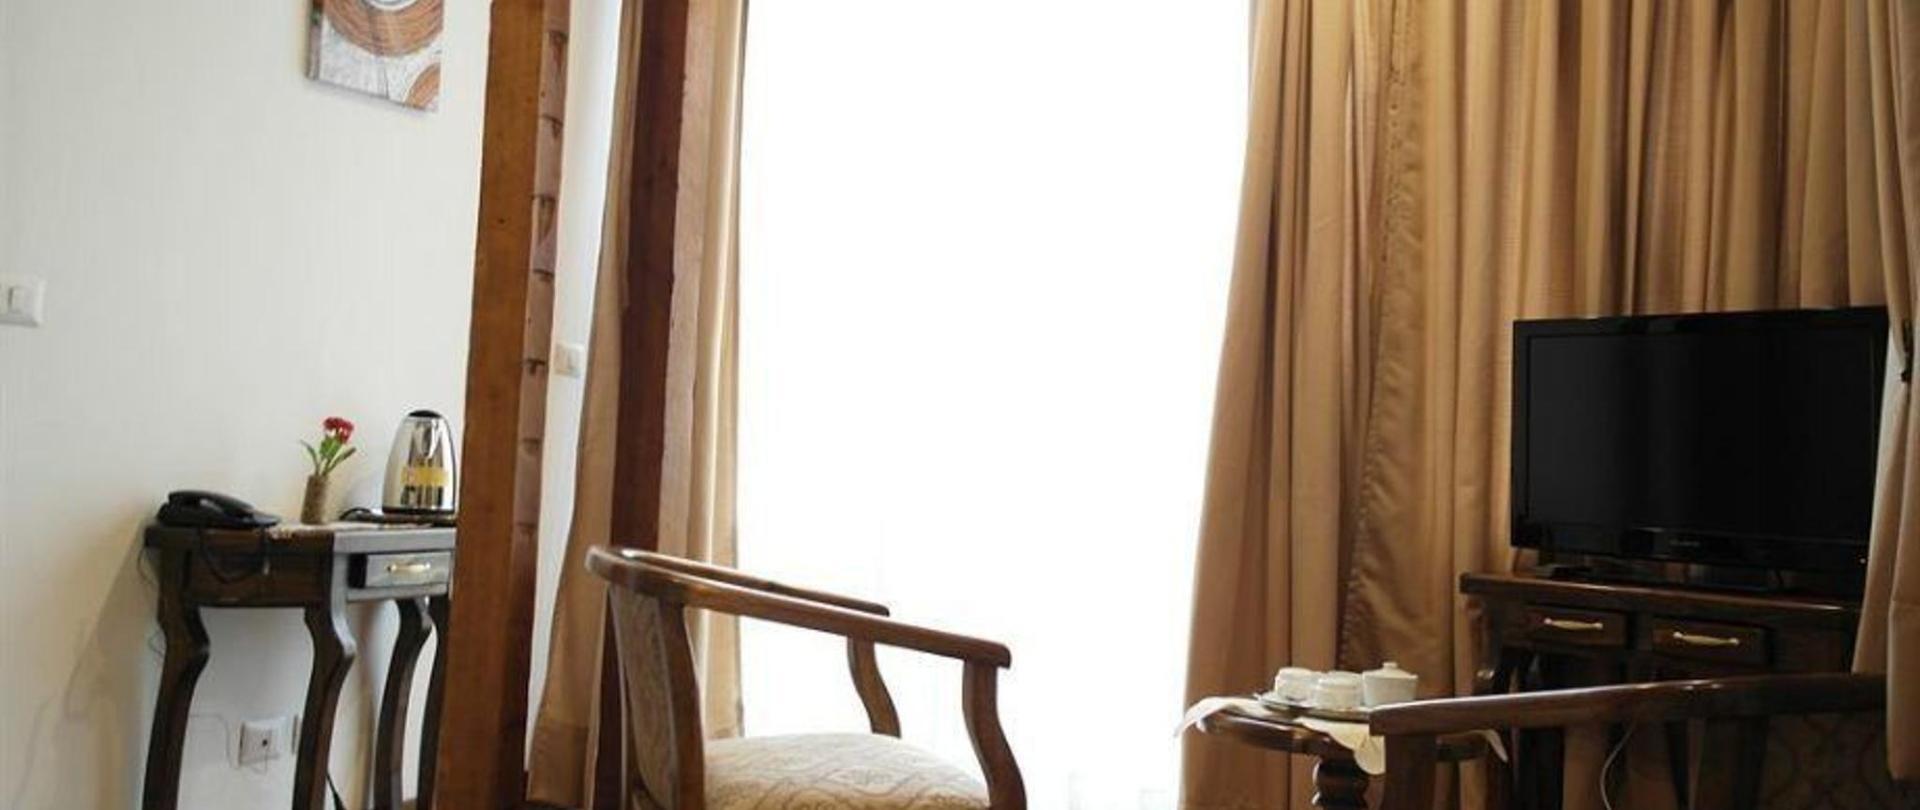 hotel_casa_lyon-providencia-info-1-734479.jpg